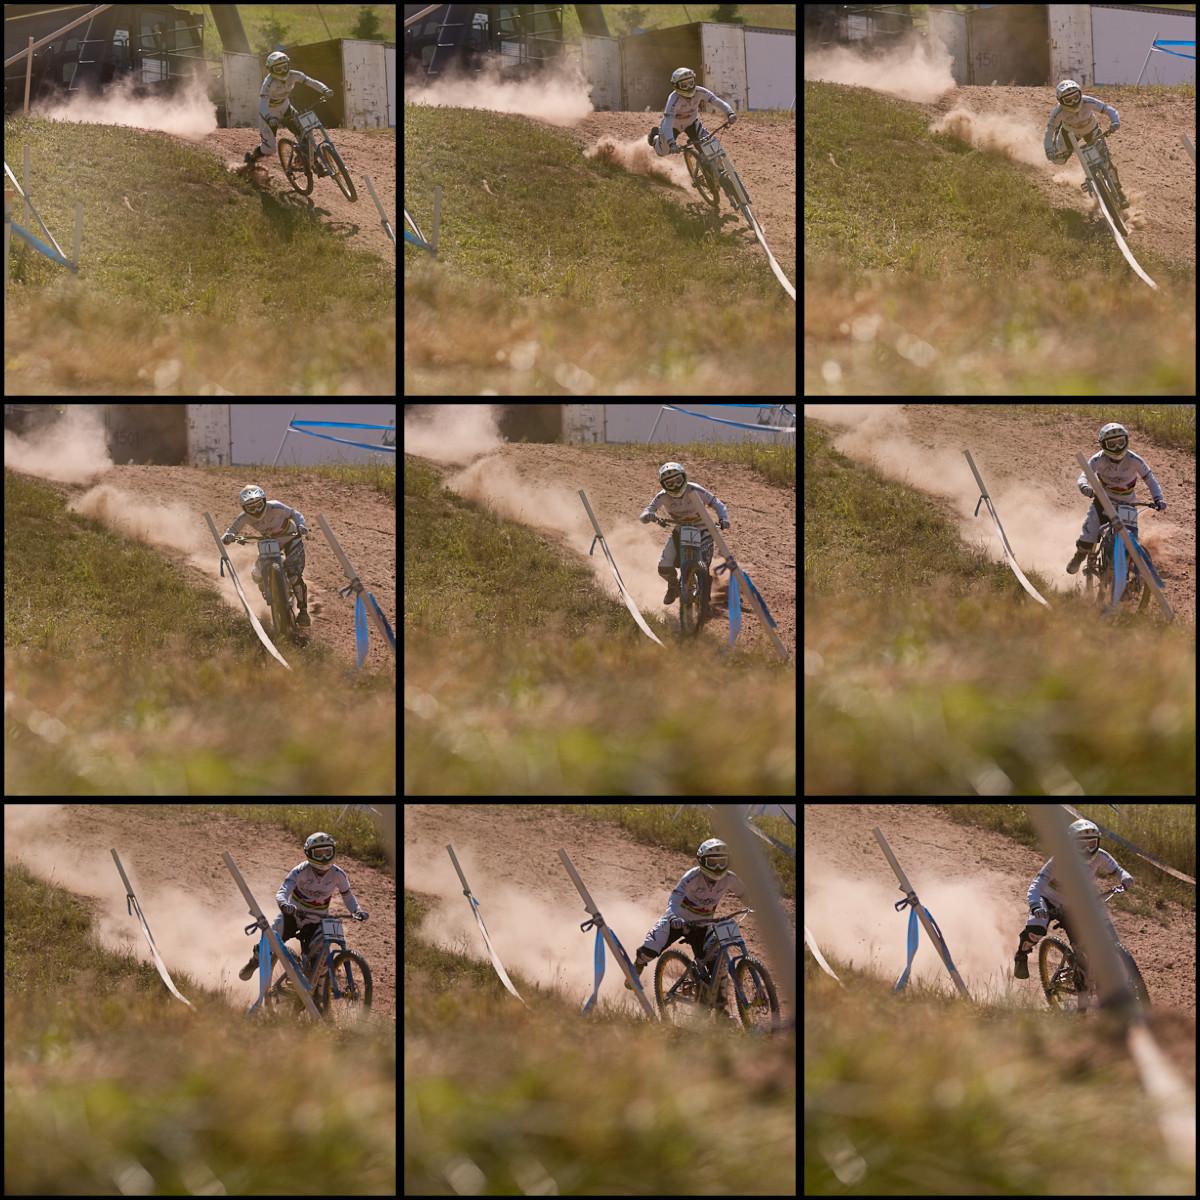 Emmeline Ragot - 2012 UCI World Cup, Windham, New York Day 2 - Mountain Biking Pictures - Vital MTB